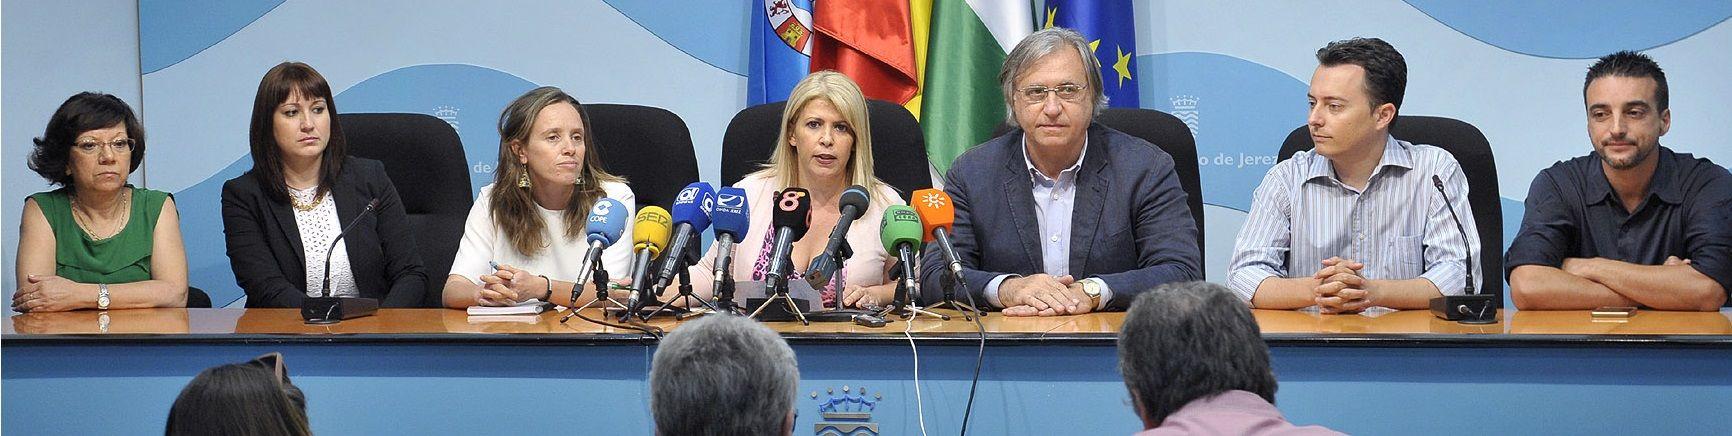 Alcaldesa informa en rueda de prensa _ 01